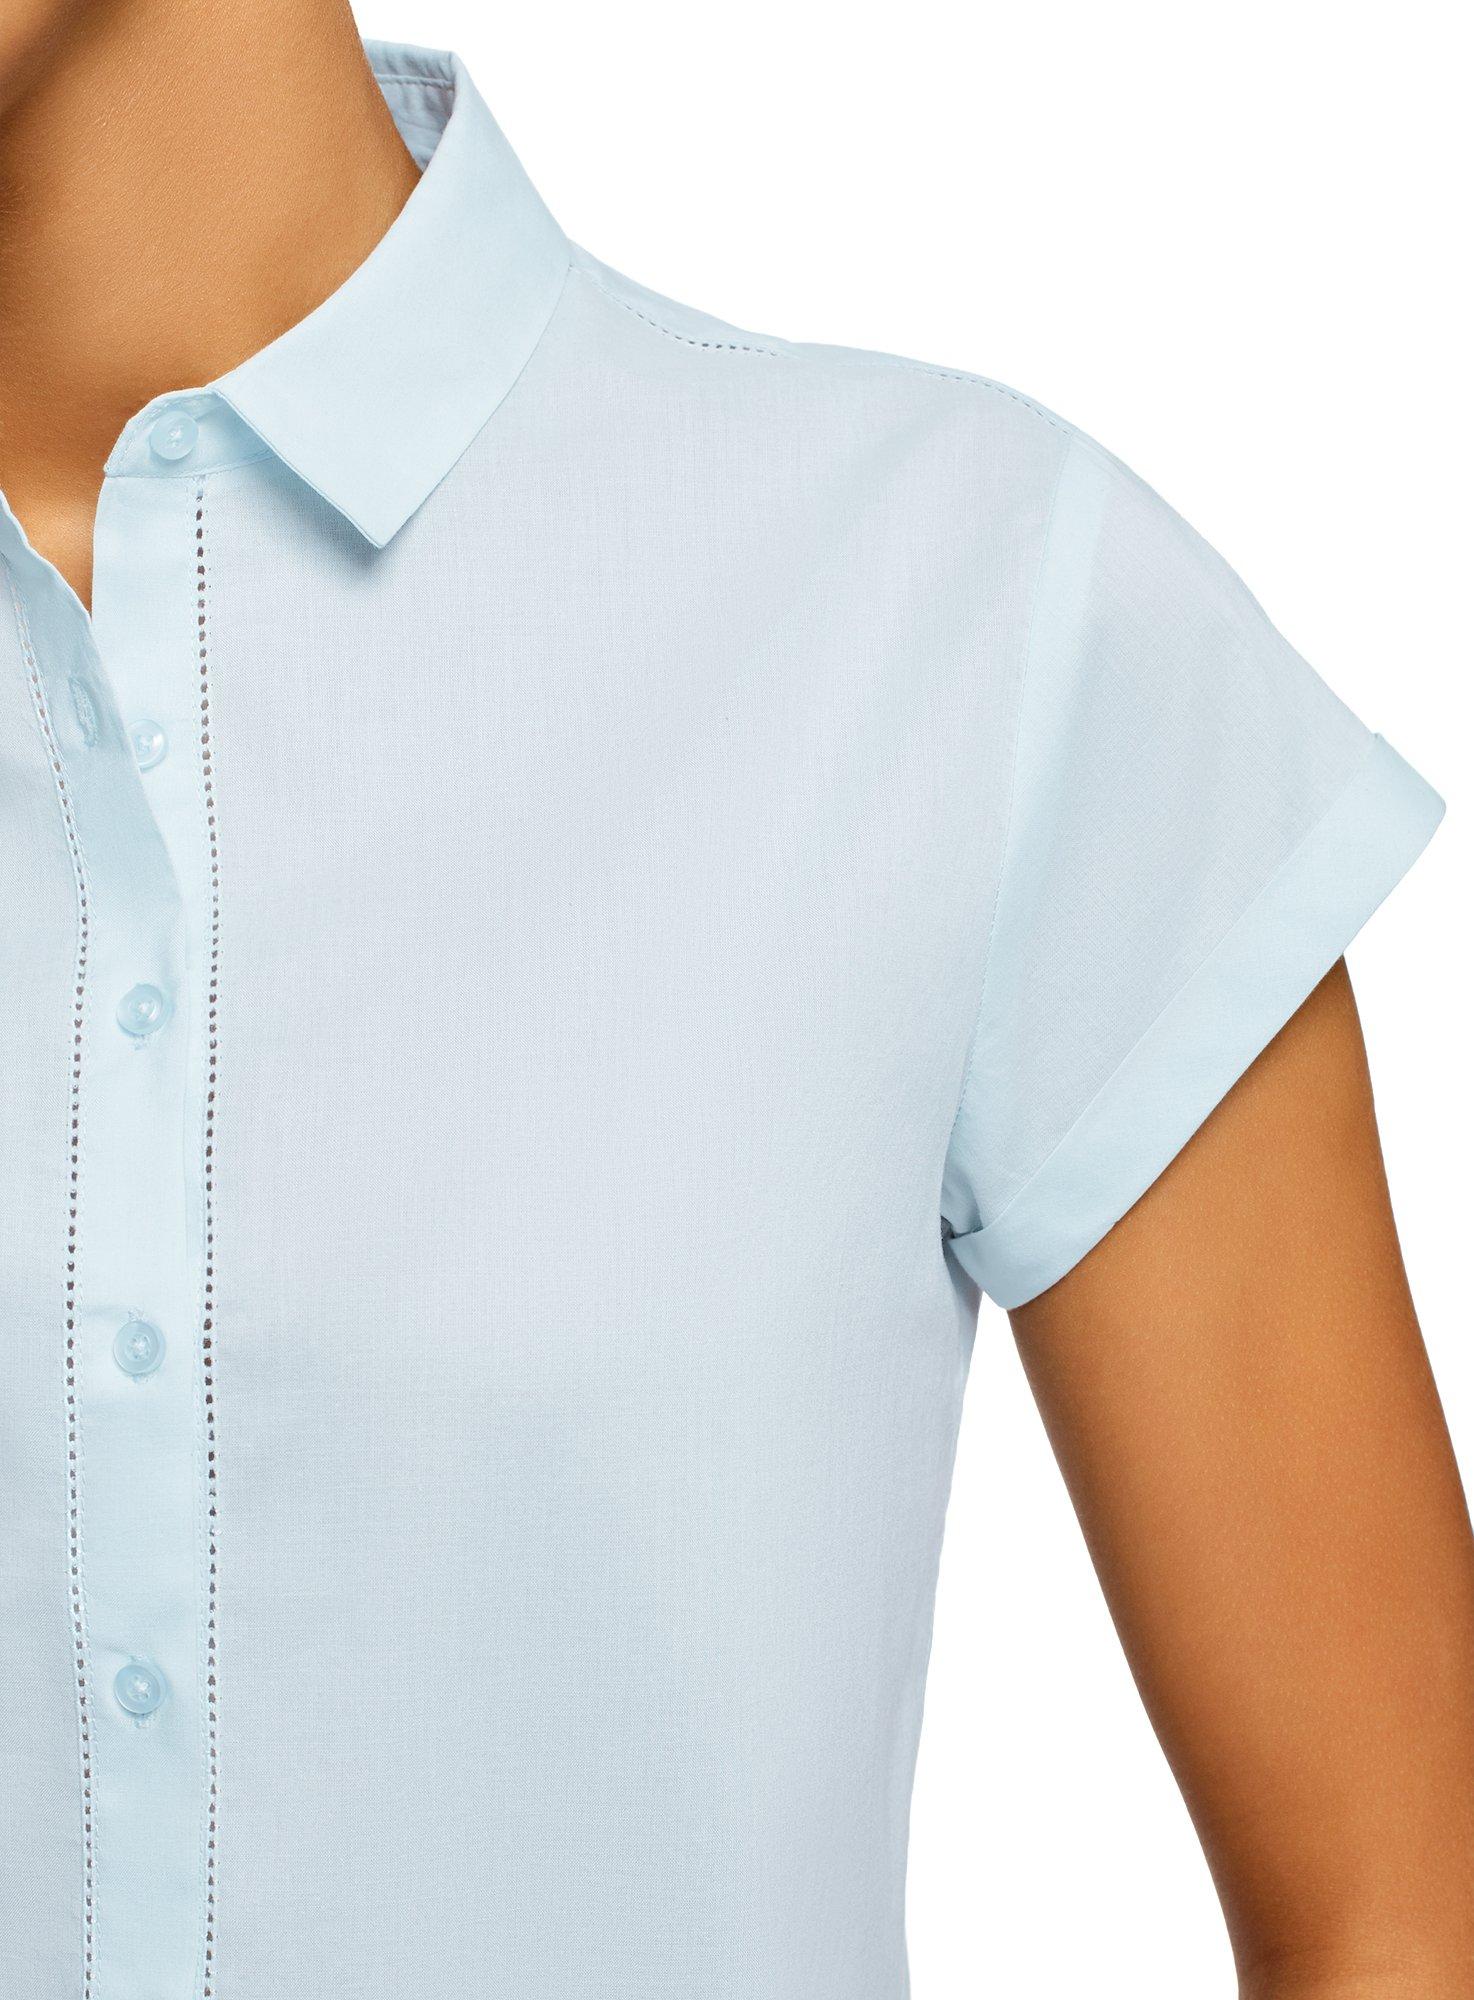 oodji Ultra Women's Short Sleeve Cotton Shirt with Turn-Ups, Blue, 2 by oodji (Image #5)